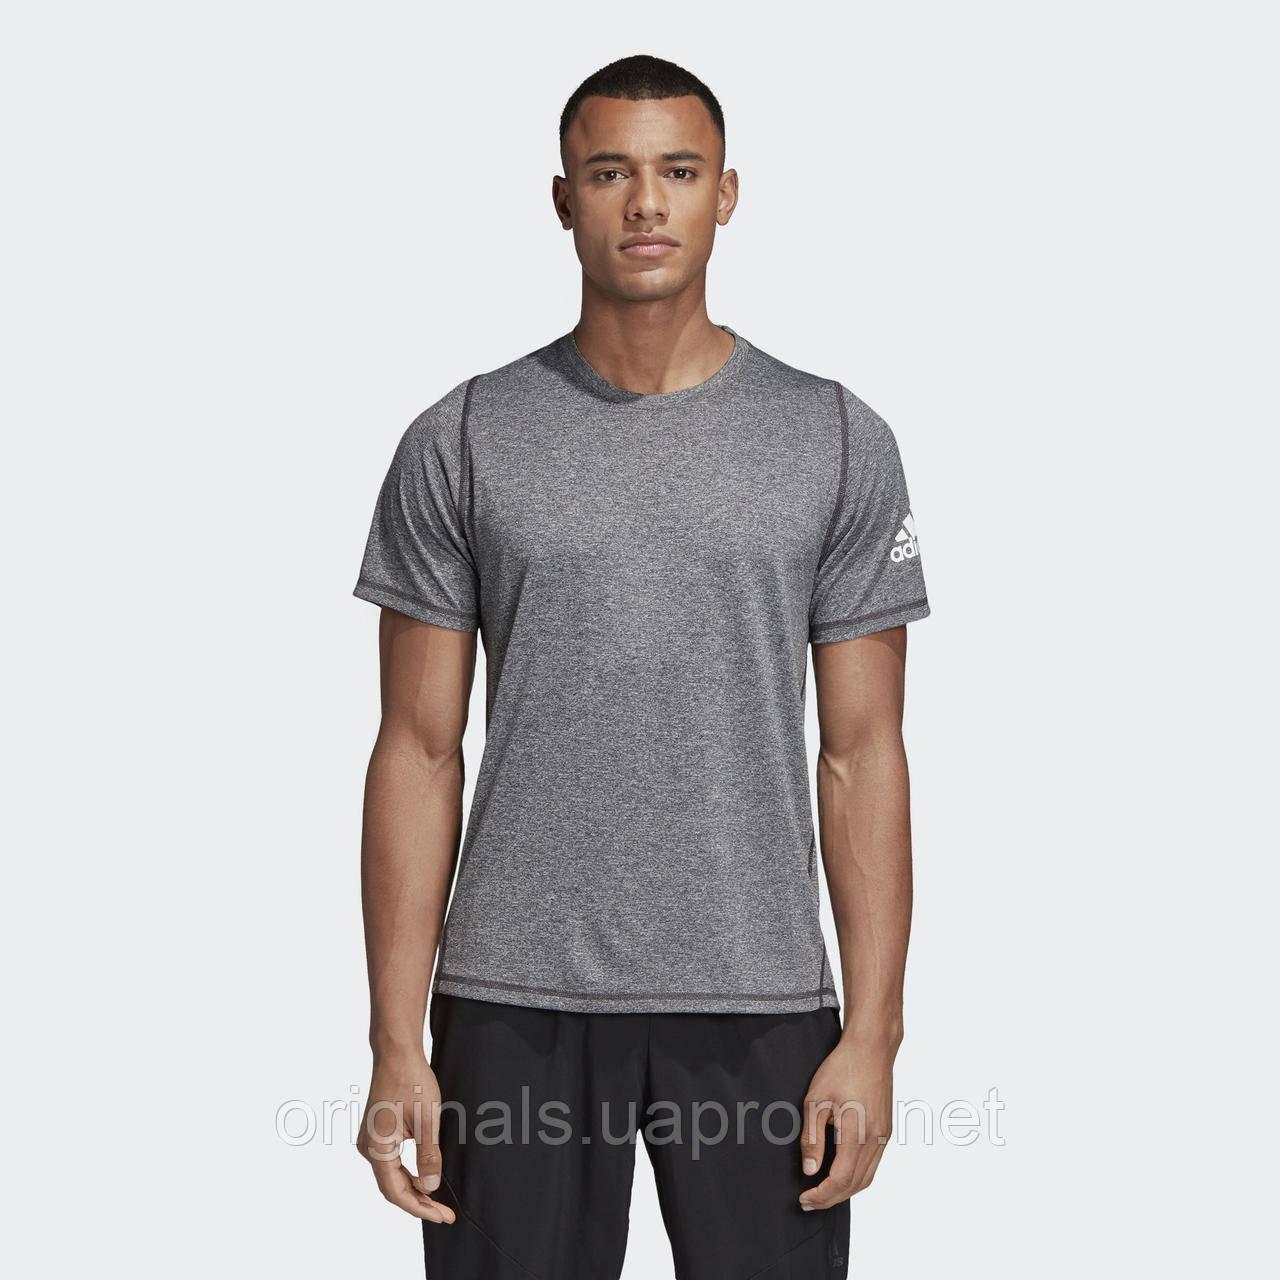 Мужская футболка Adidas FreeLift Sport Ultimate Heather DU1450